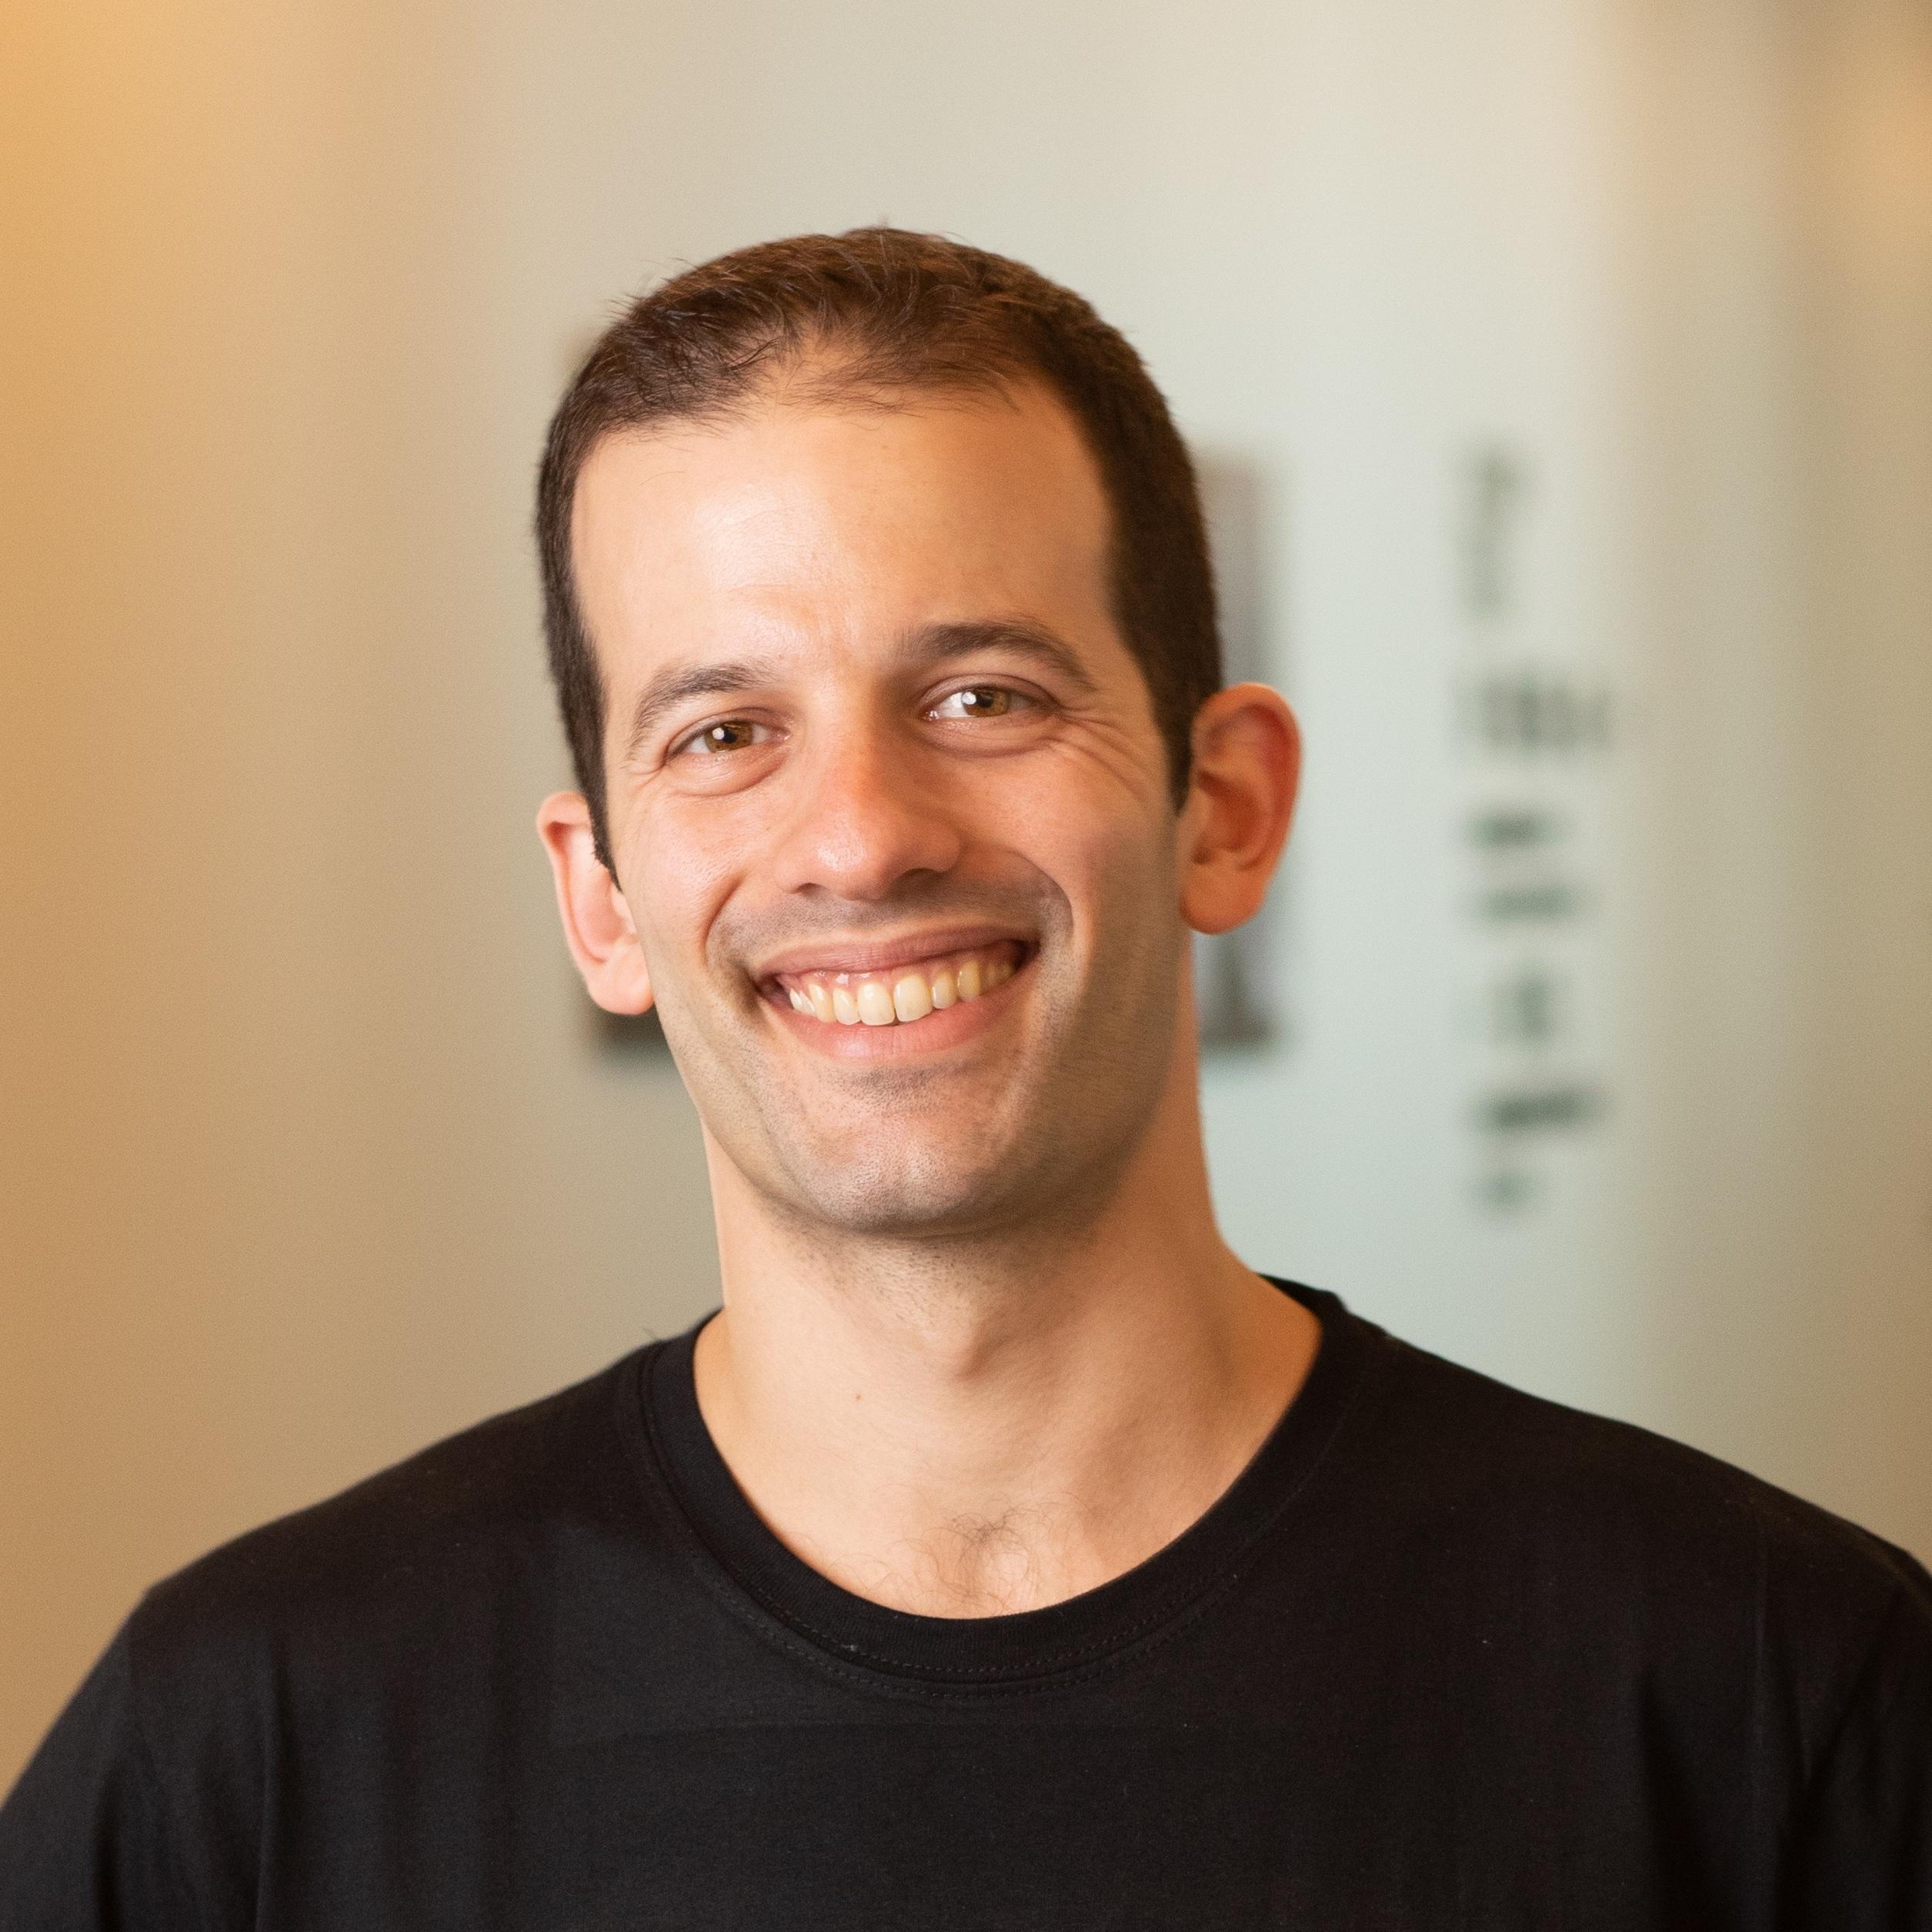 Tal Kain, CEO & Co-Founder